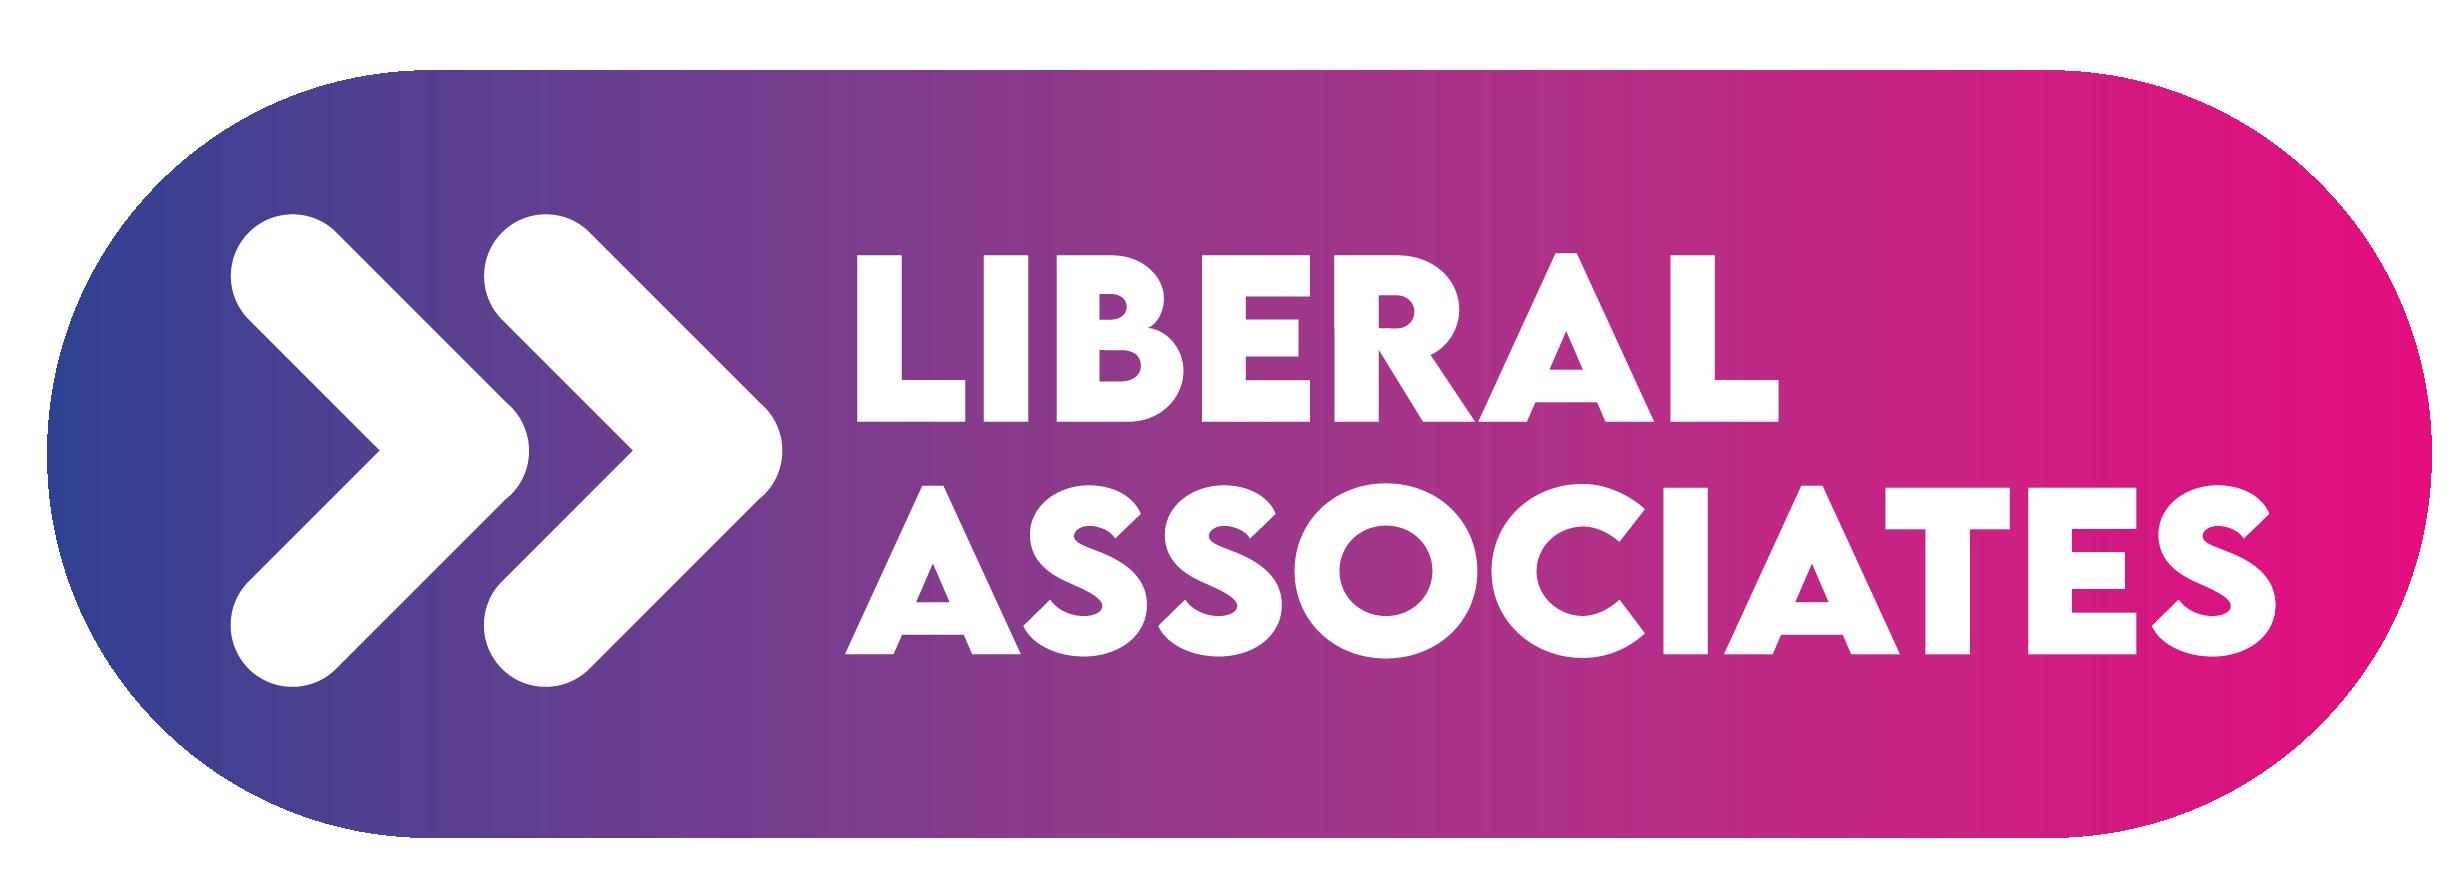 Liberal Associates Logo